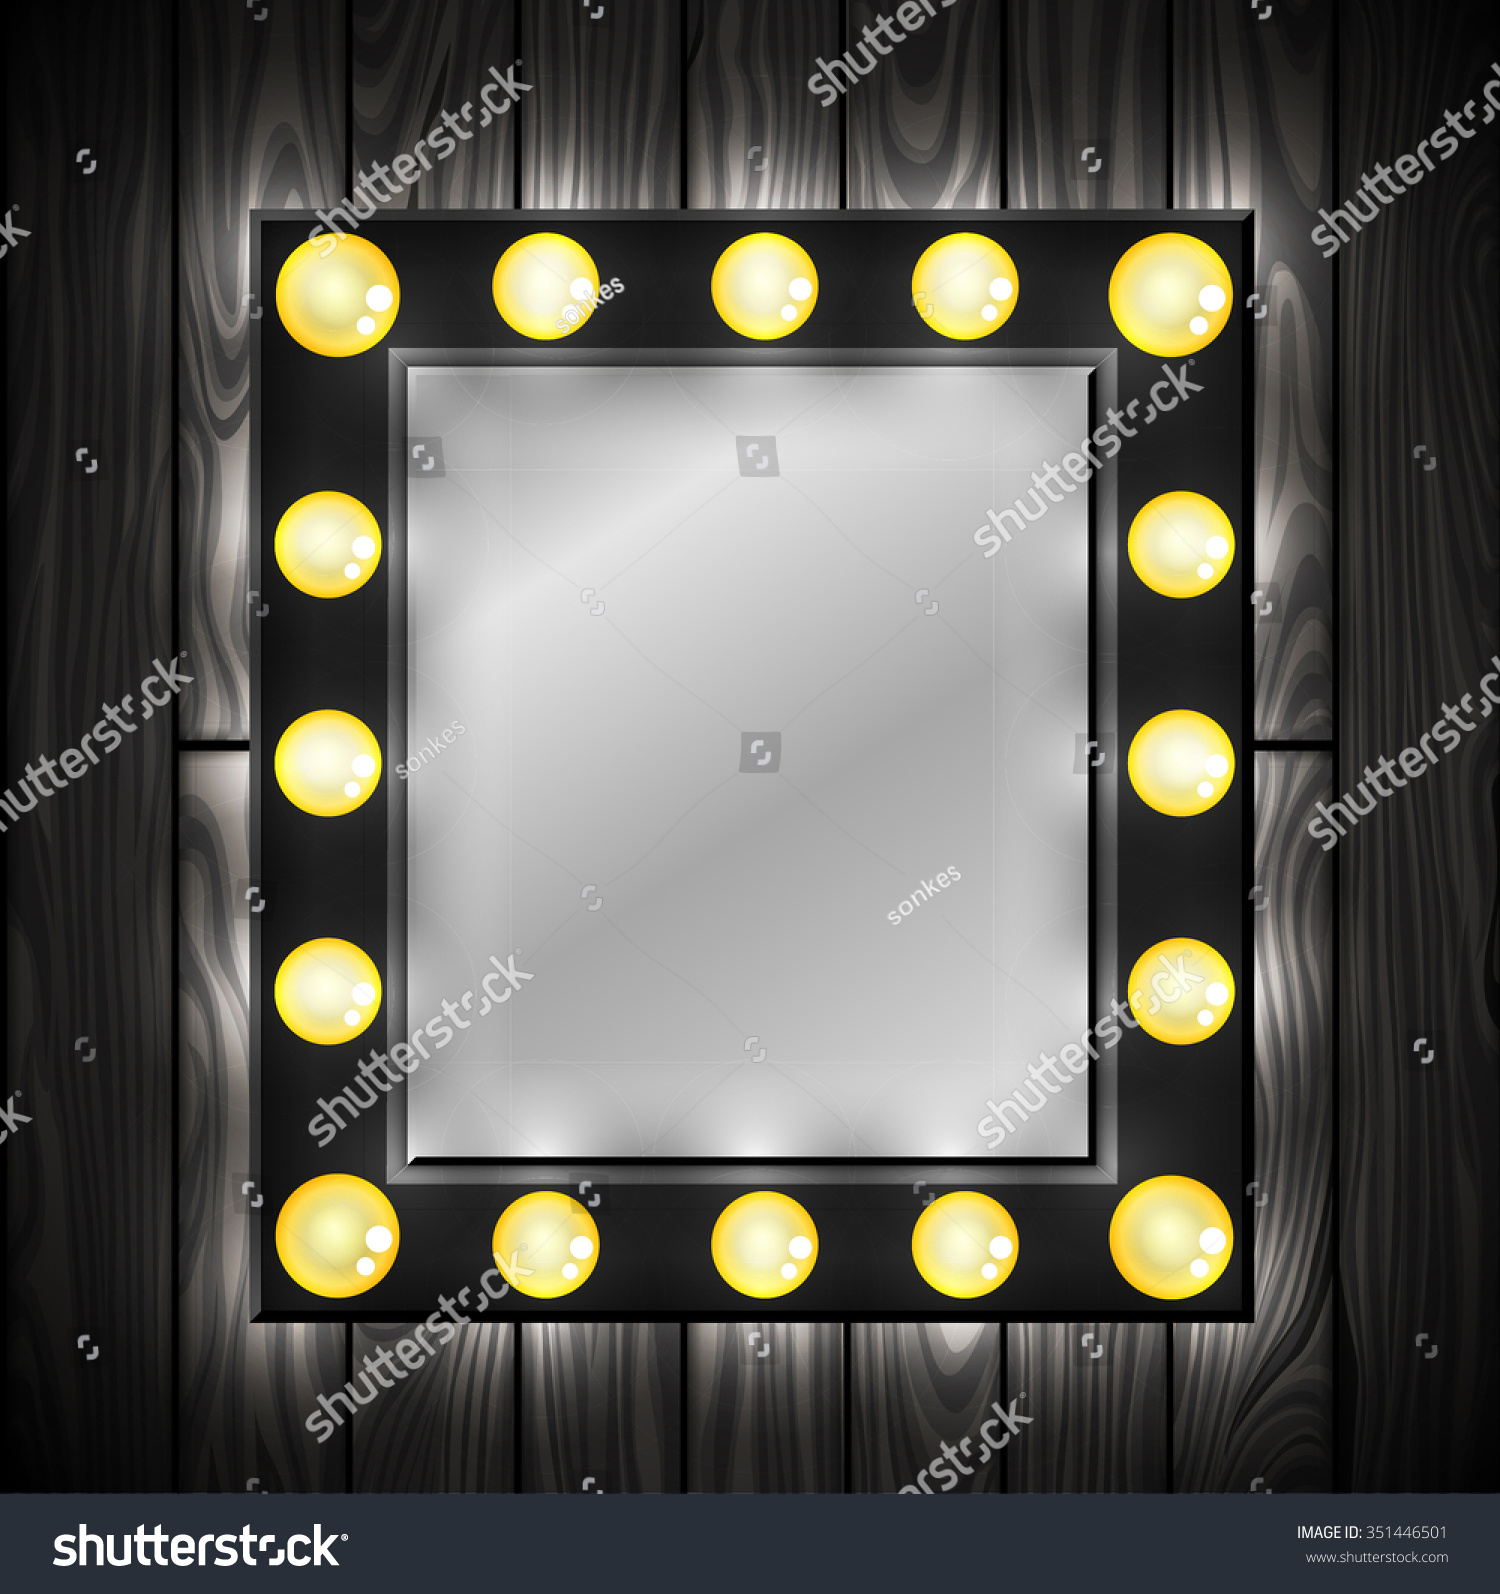 Black Mirror Light Bulbs Dressing Room Stock Vector 351446501 ...:Black mirror. Light bulbs. Dressing room. Wooden background. Vector,Lighting